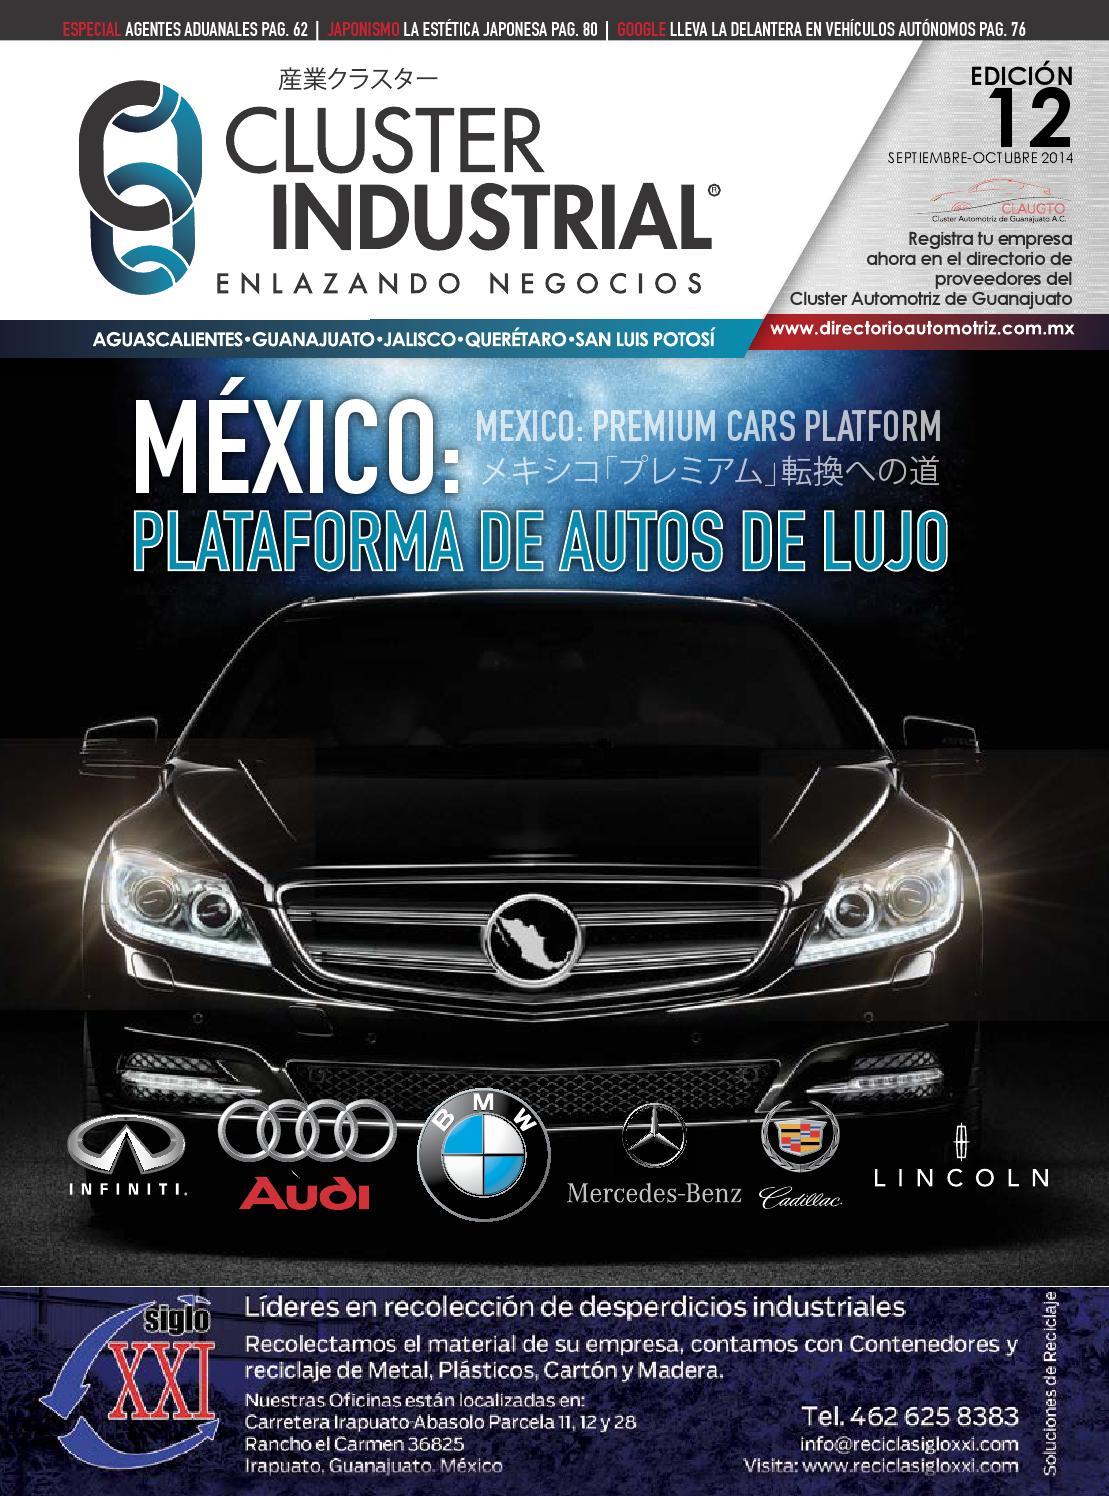 Edici N 08 Enero Febrero 2014 By Cluster Industrial Issuu # Tutto Muebles Qro